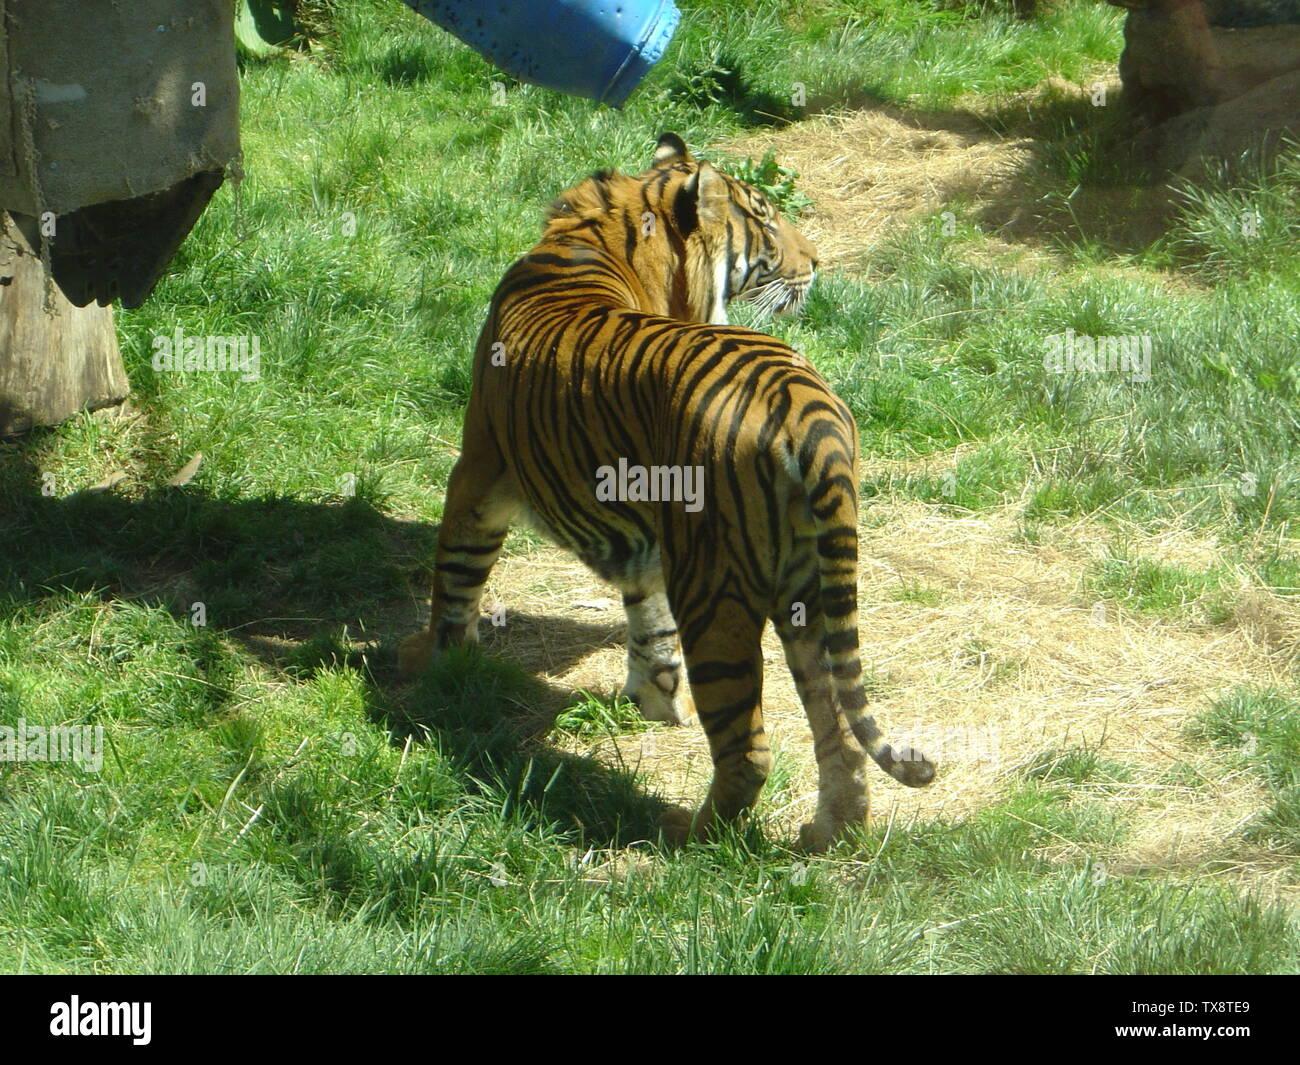 tiger zoophilia The Mirror